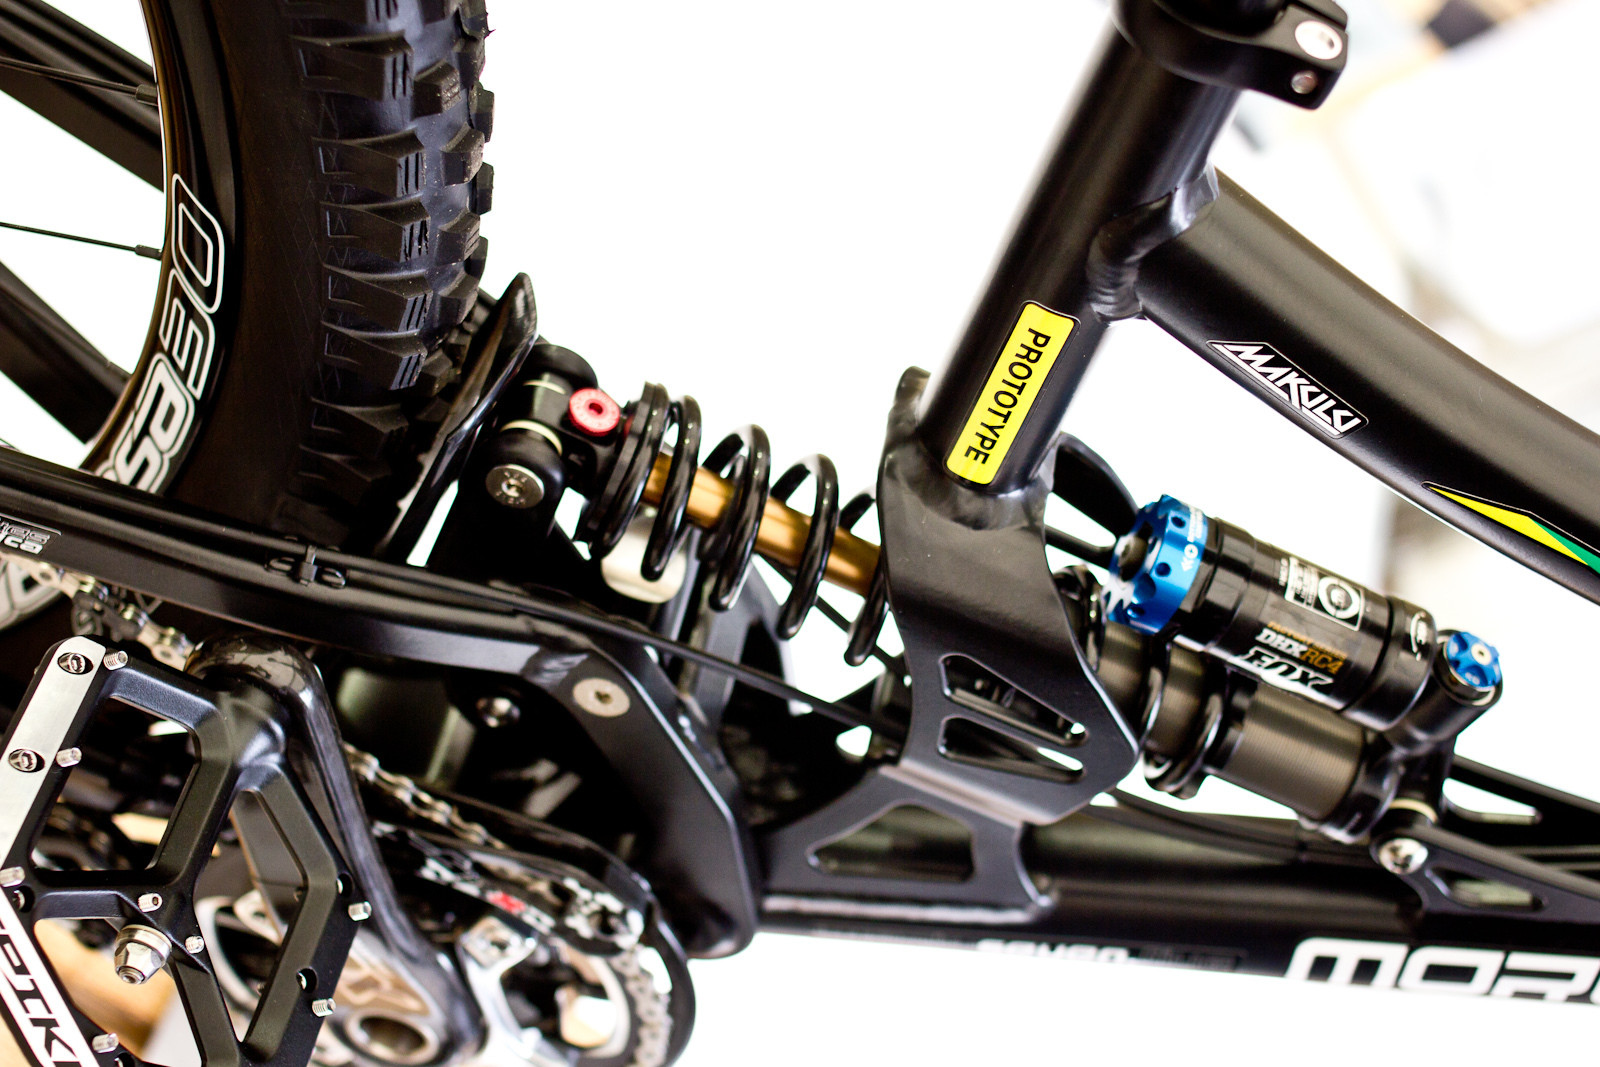 2014 Morewood Makulu 650B Prototype DH Bike  - 2014 Downhill Bikes at Eurobike 2013 - Mountain Biking Pictures - Vital MTB